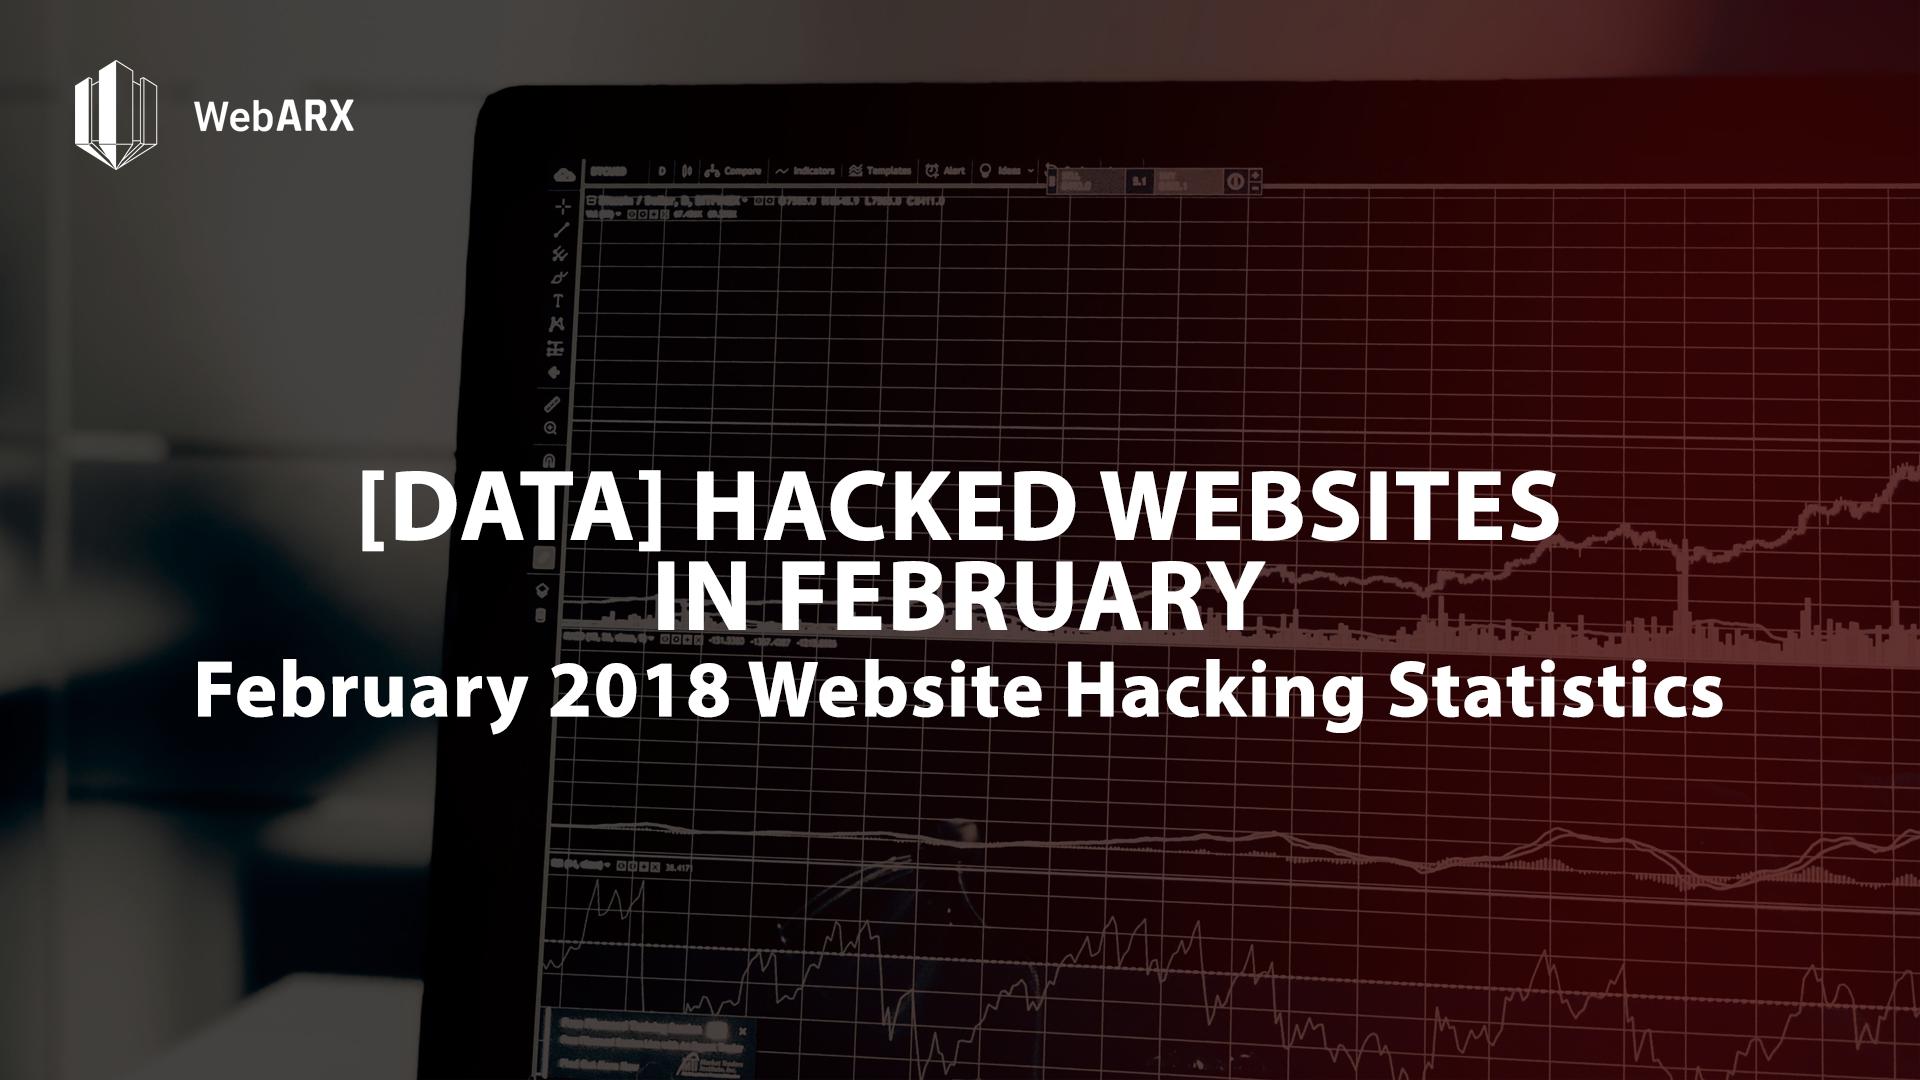 february 2018 website hacking statistics webarx